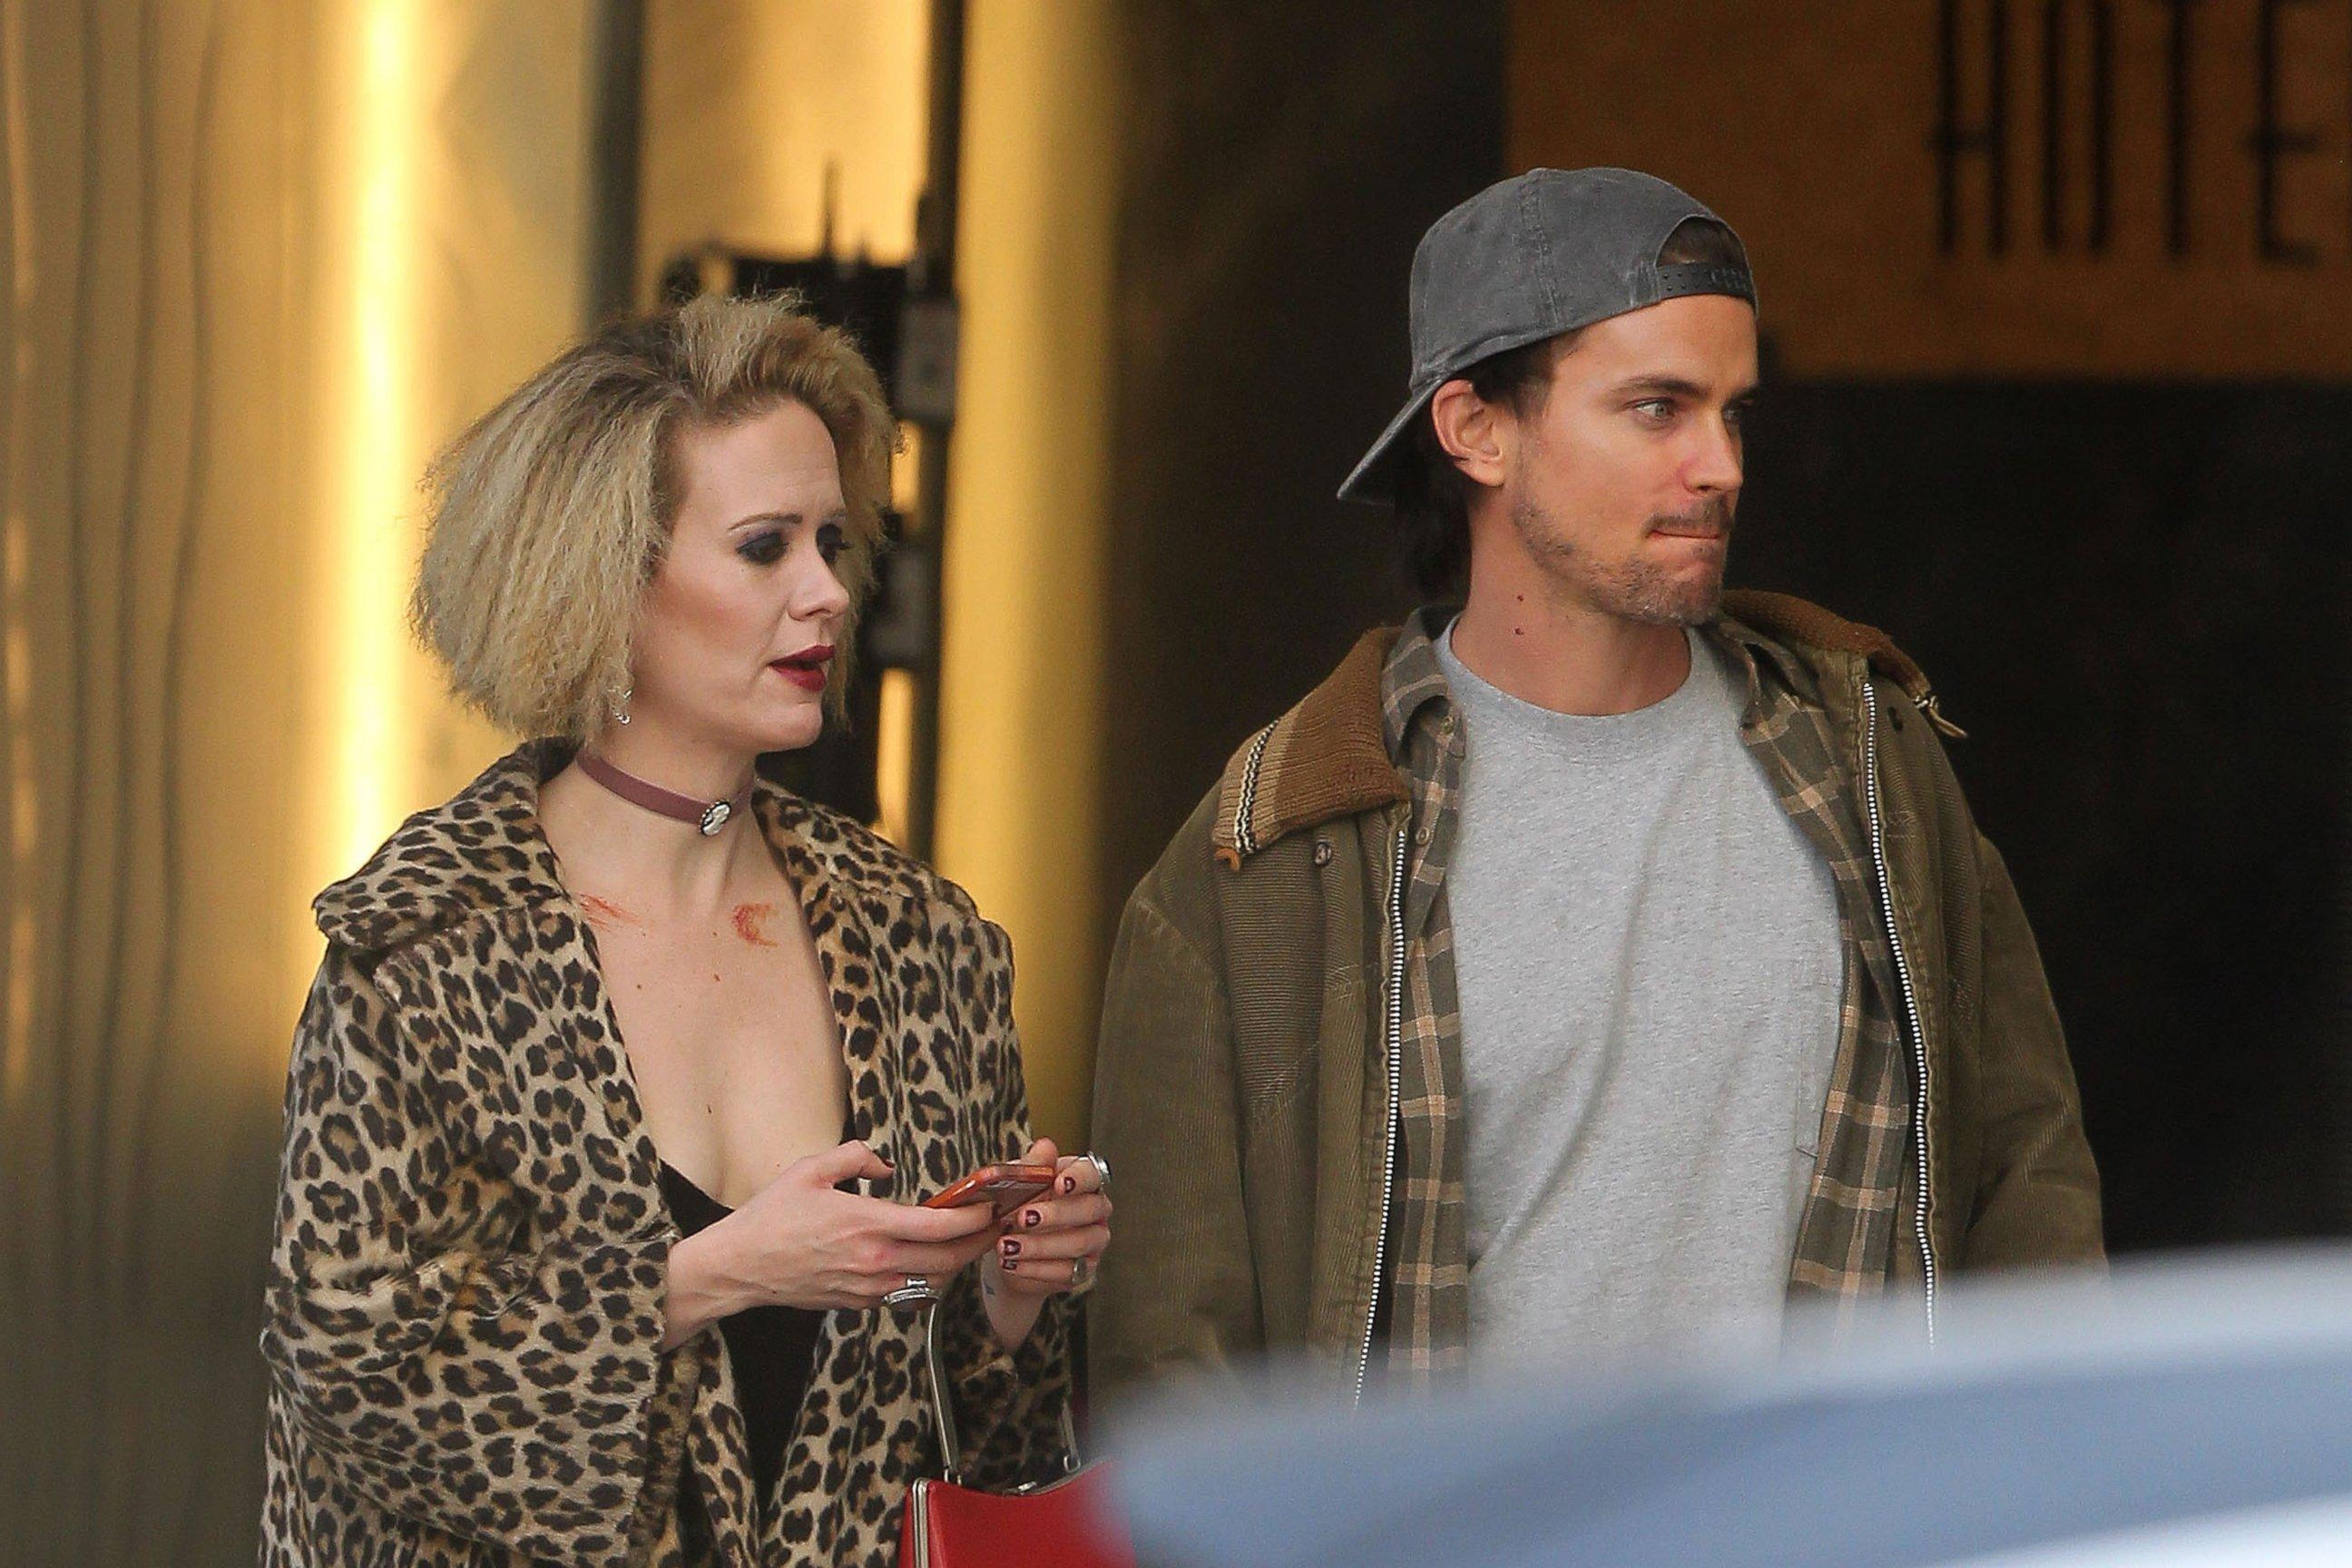 Go On Set of AHS:Hotel with Matt Bomer and Sarah Paulson